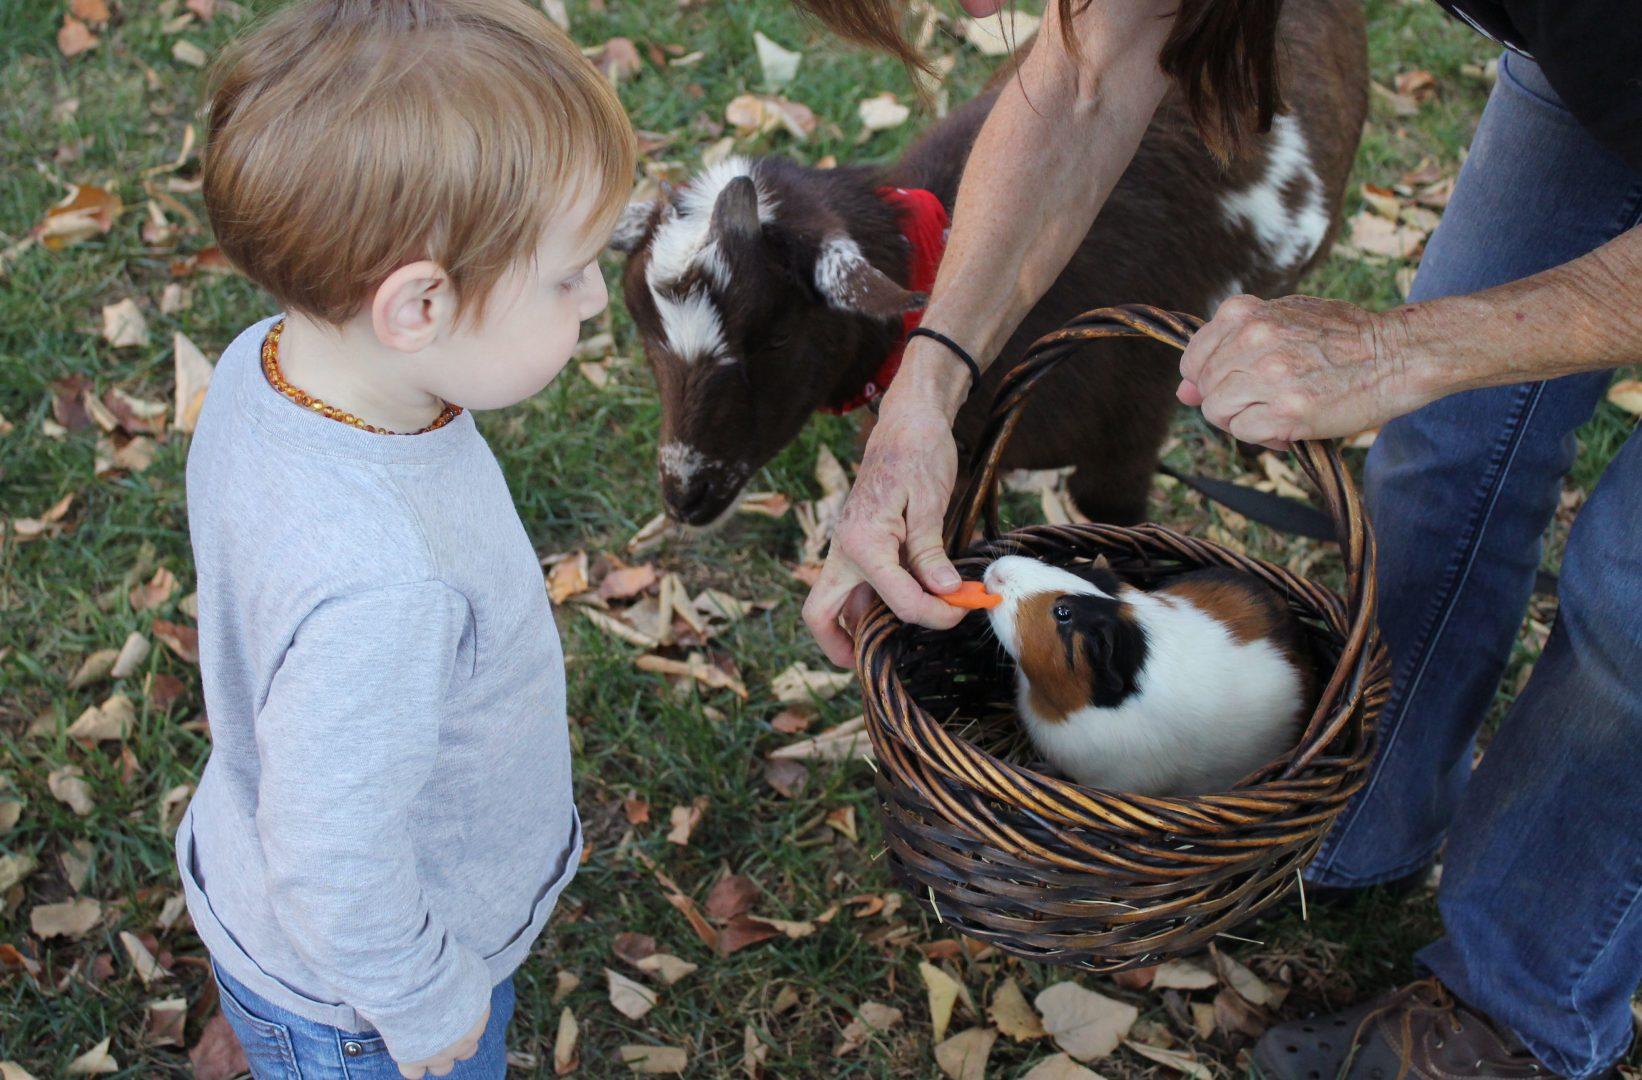 Hesketh Farm Park